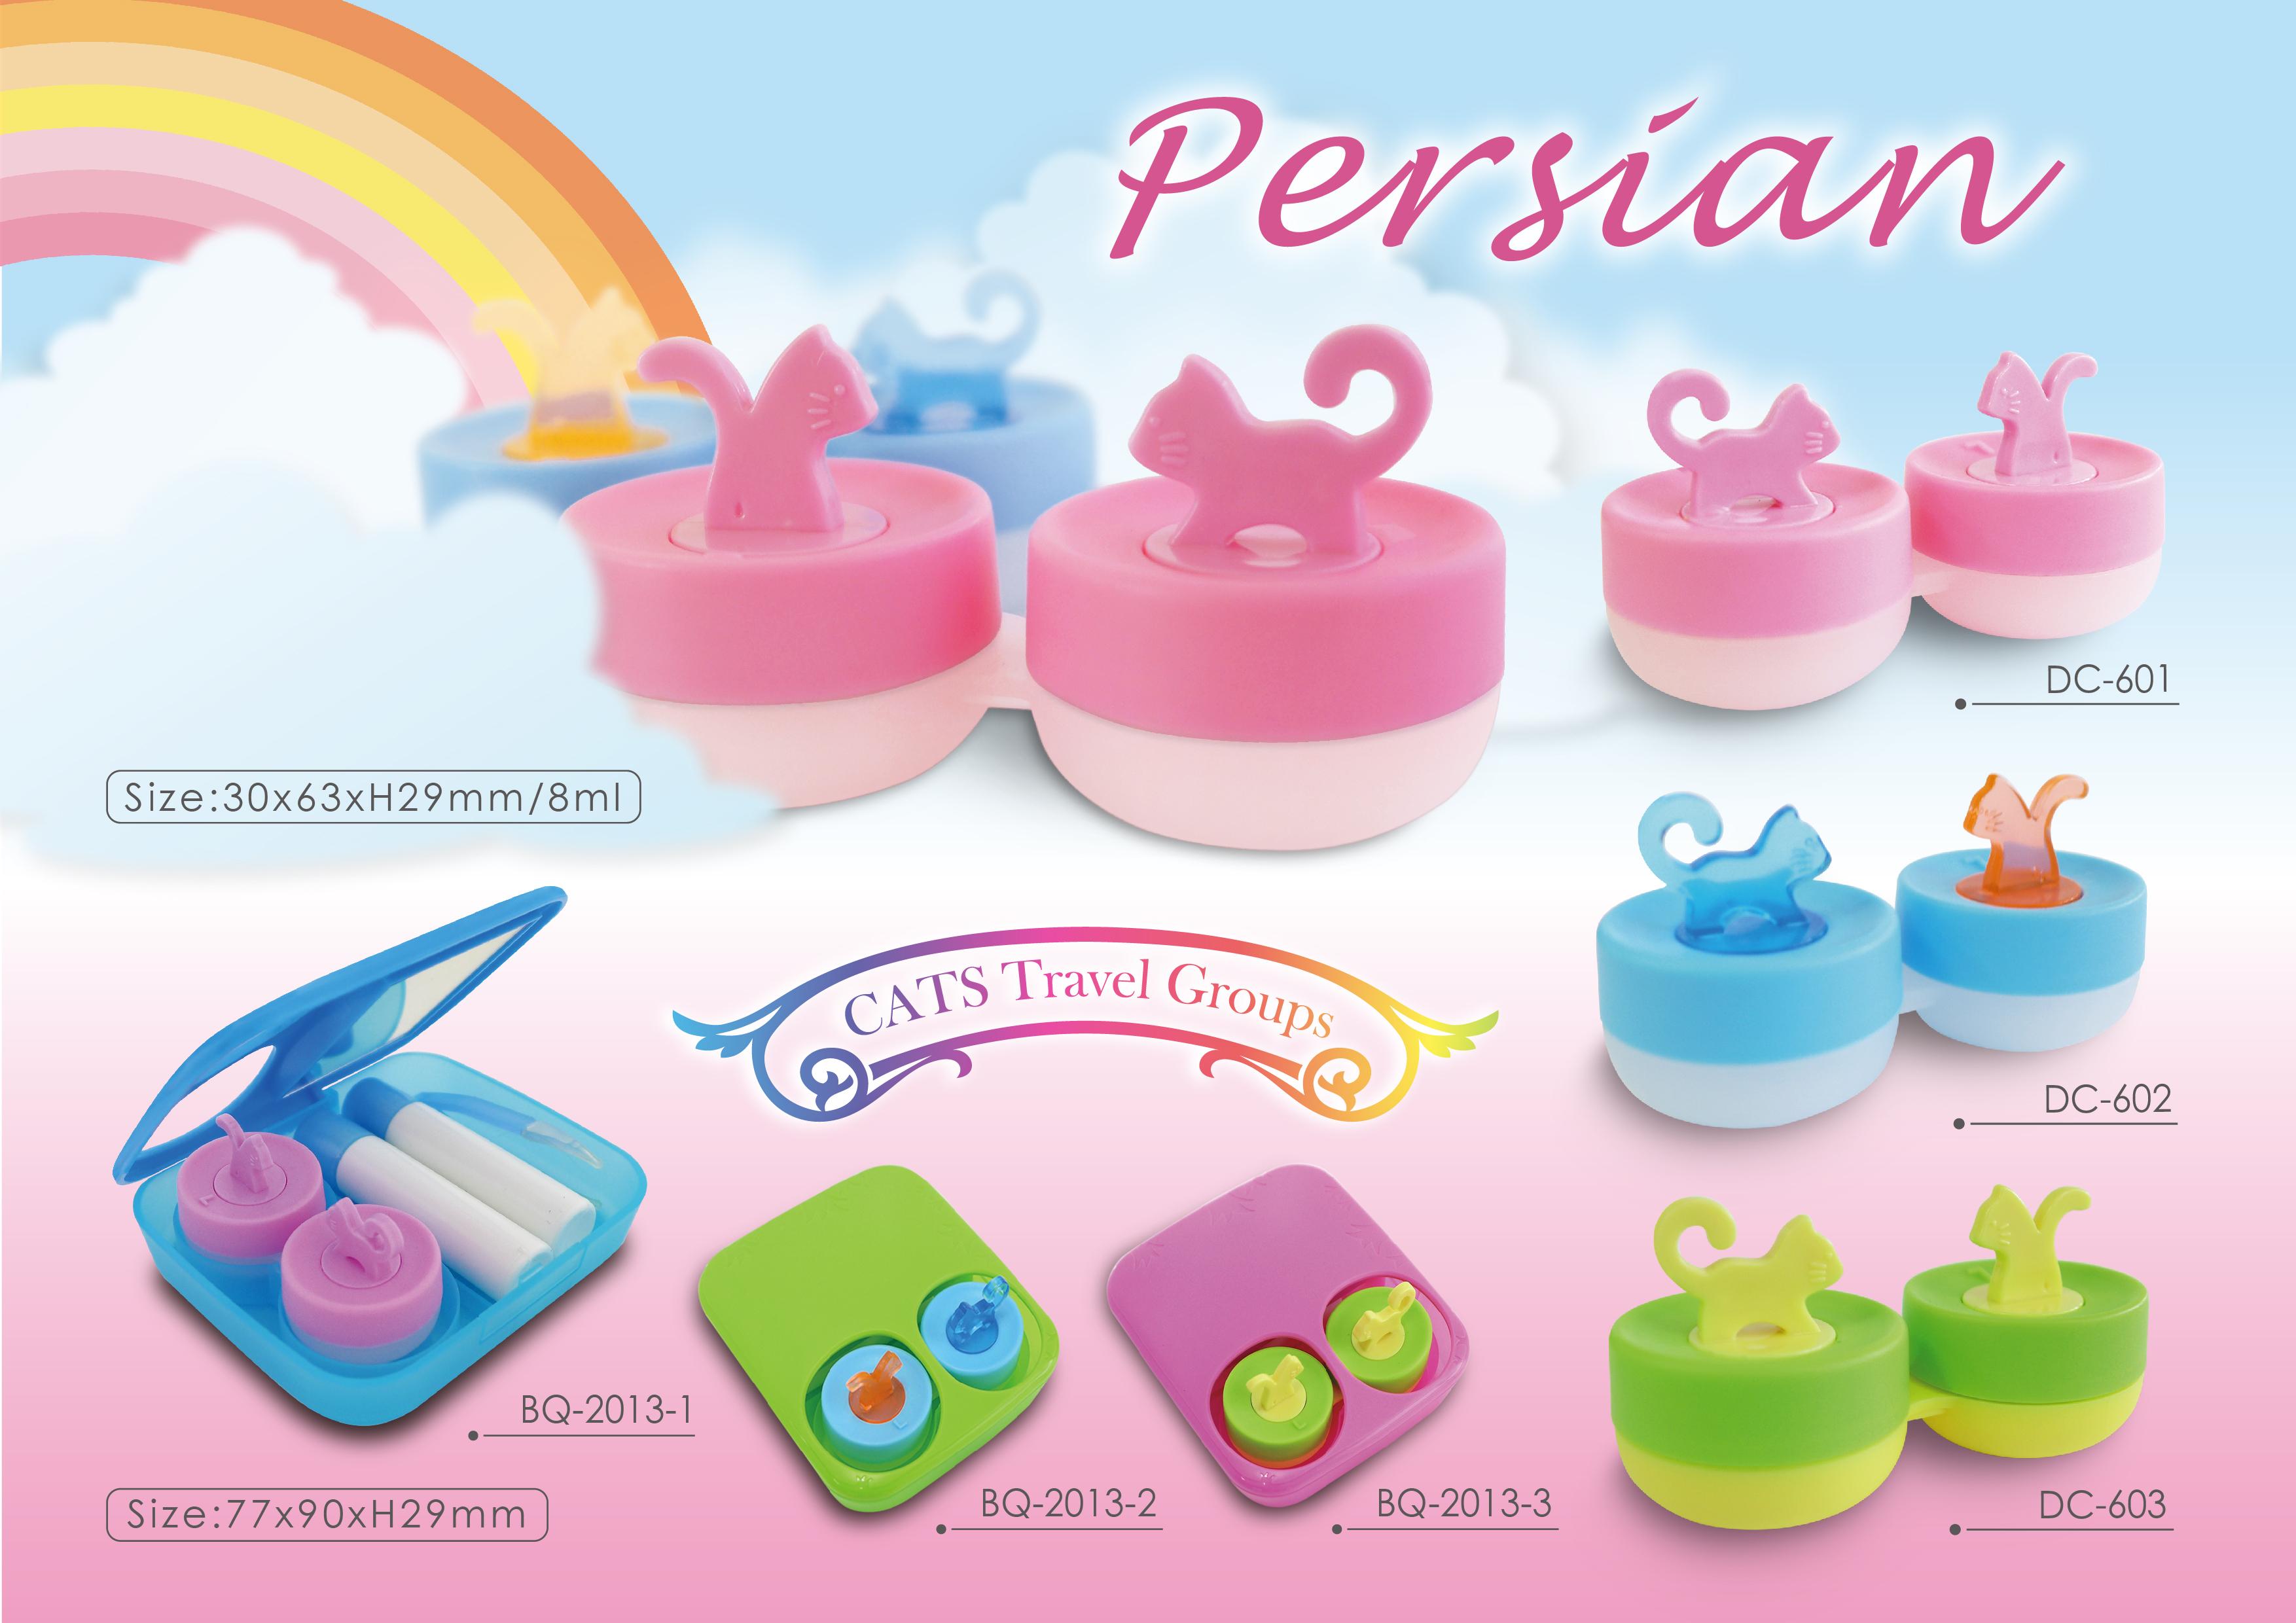 Persian & BQ-2013